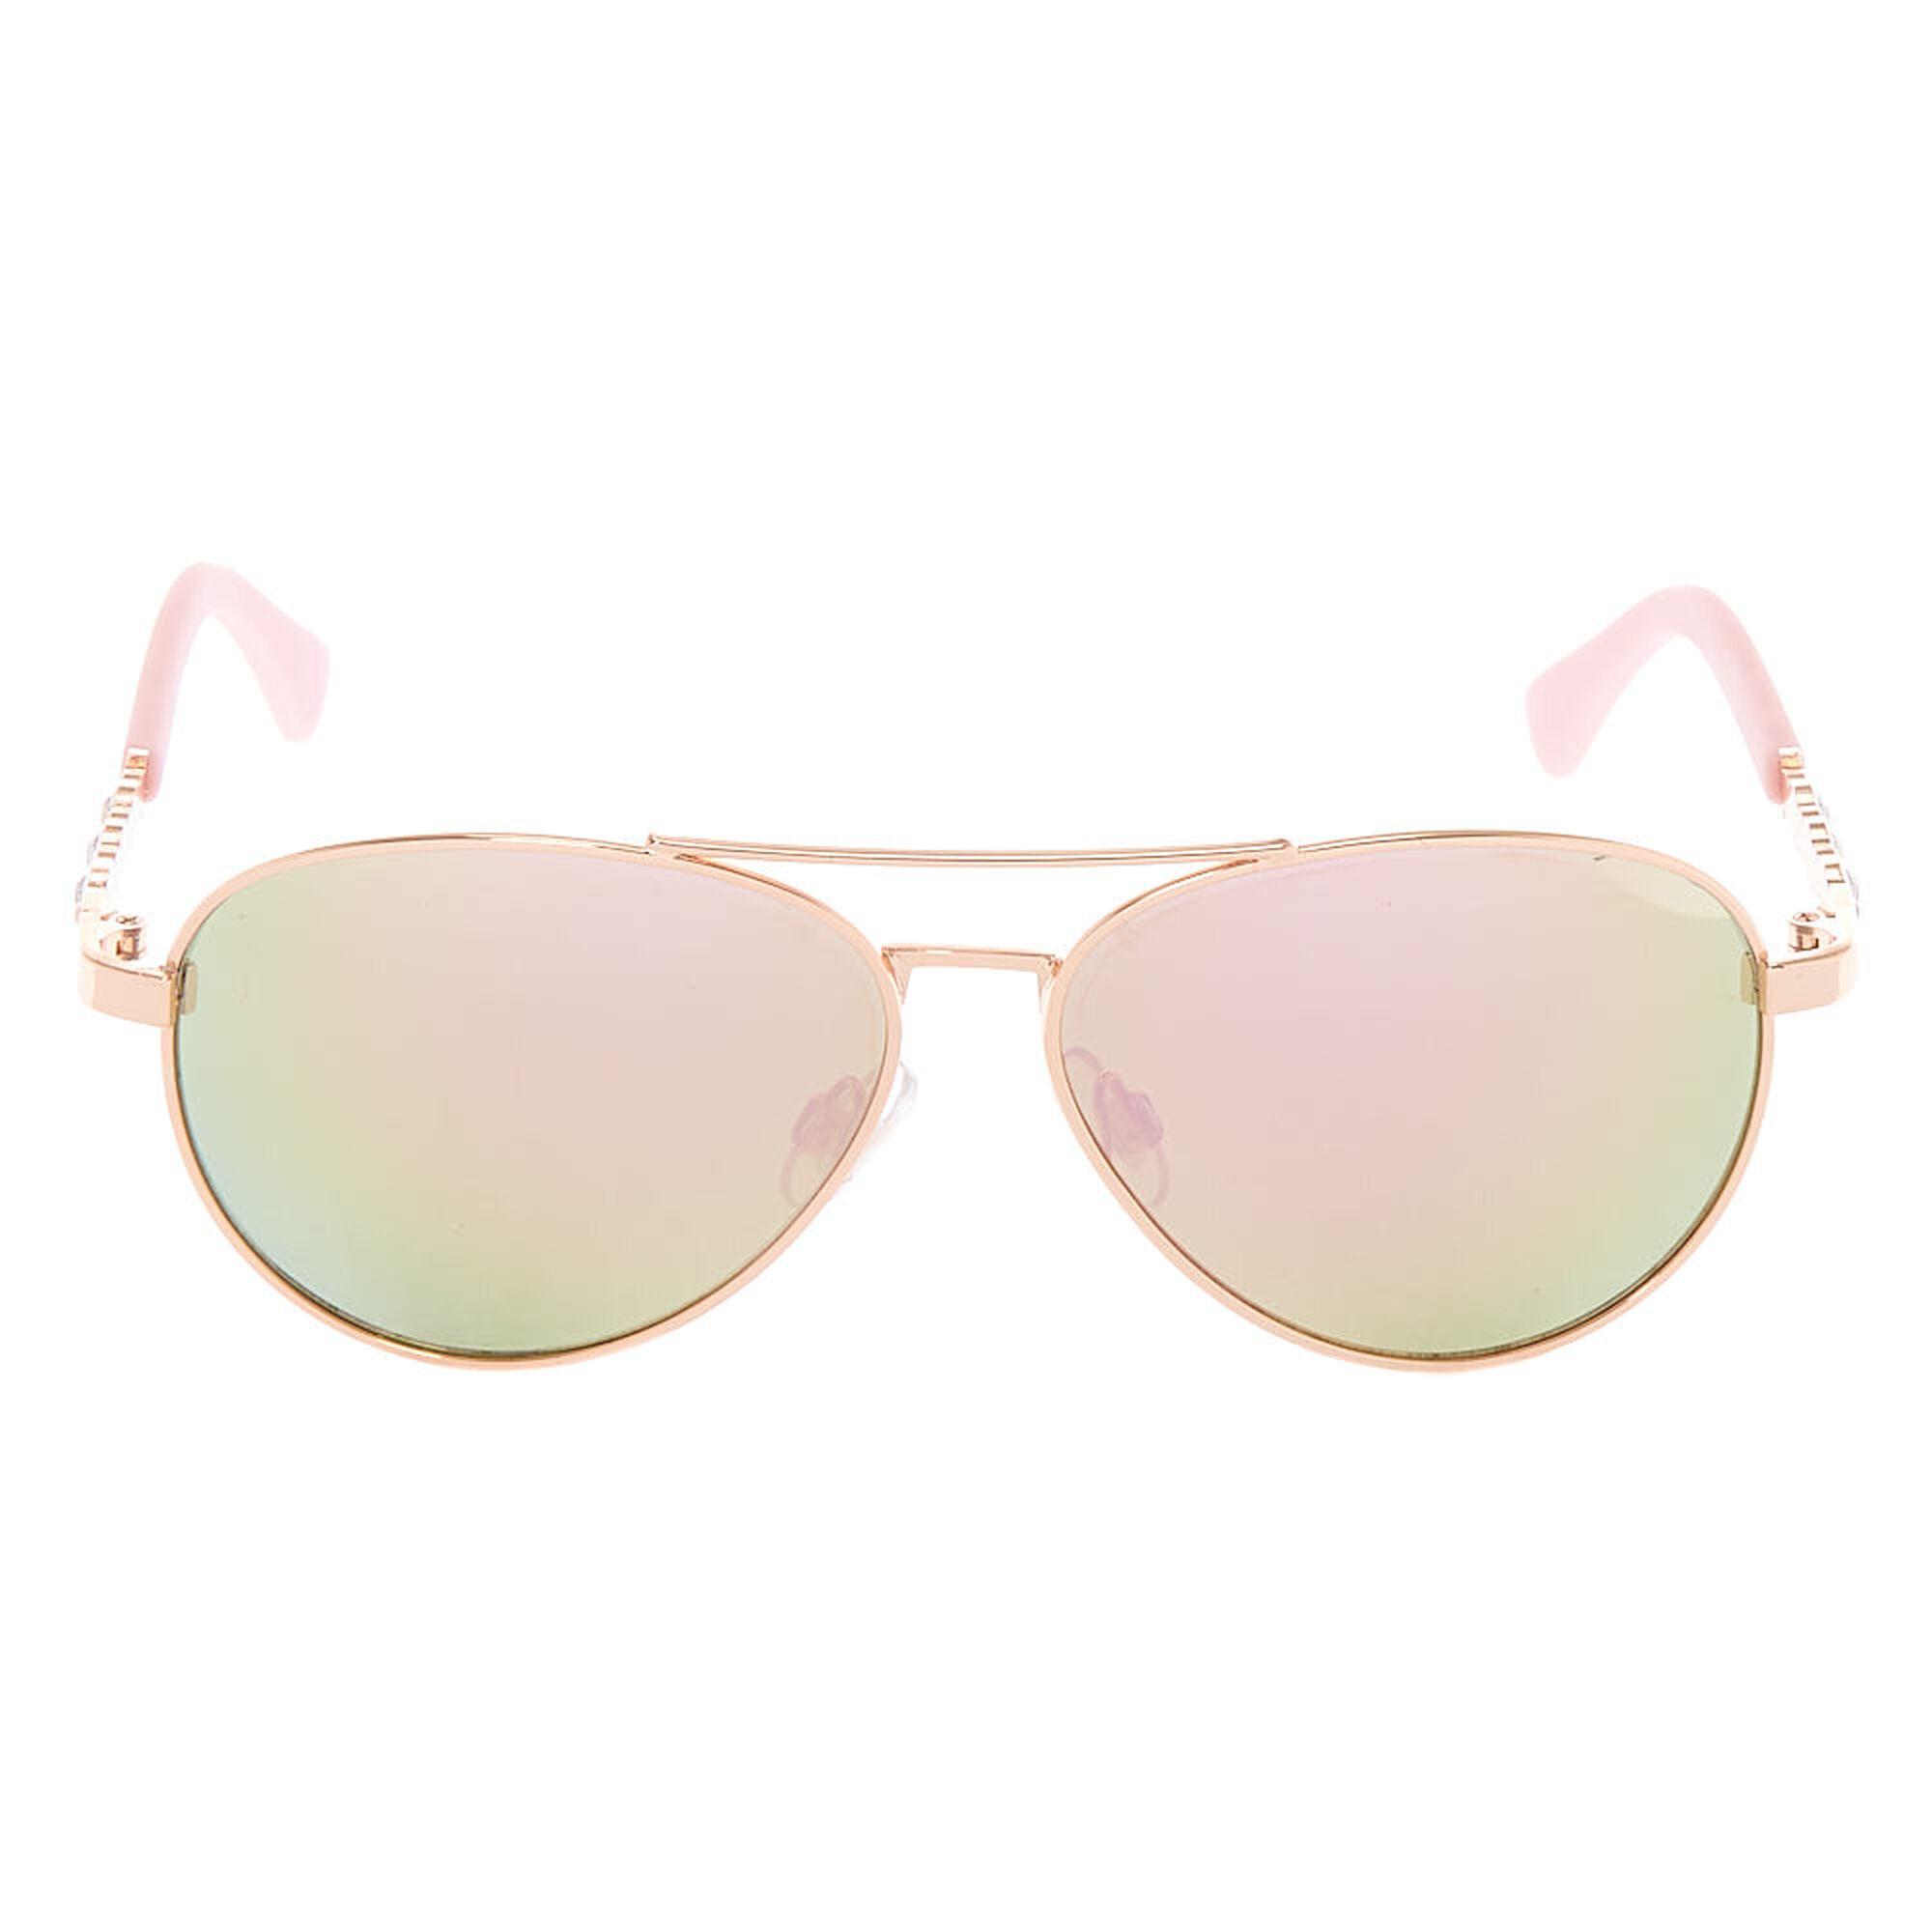 3afdb717f6 ... Claire  39 s Club Rose Gold Gem Aviator Sunglasses - Pink